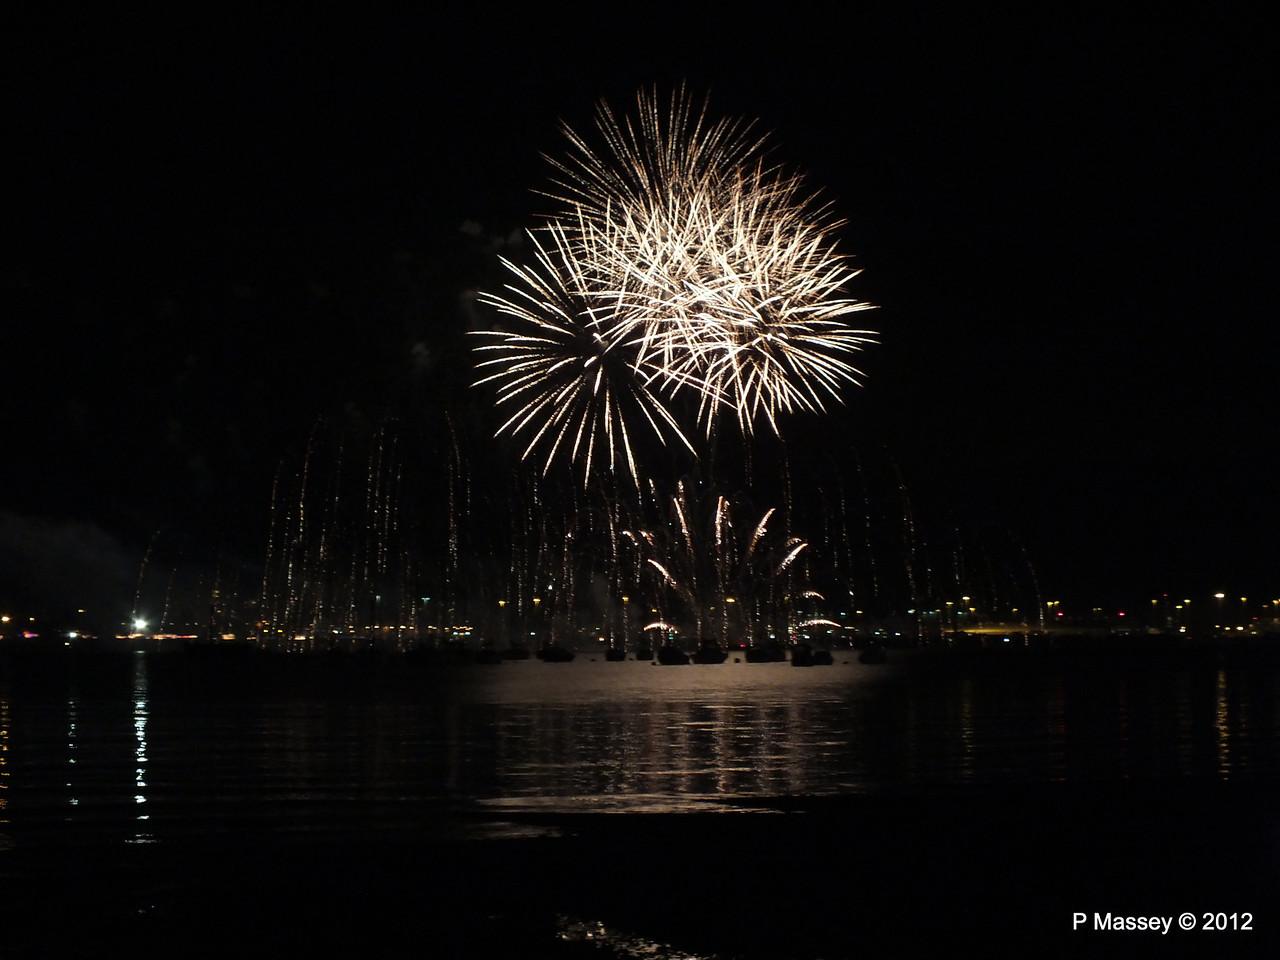 Fireworks off Mayflower Park PDM 03-11-2012 20-55-14